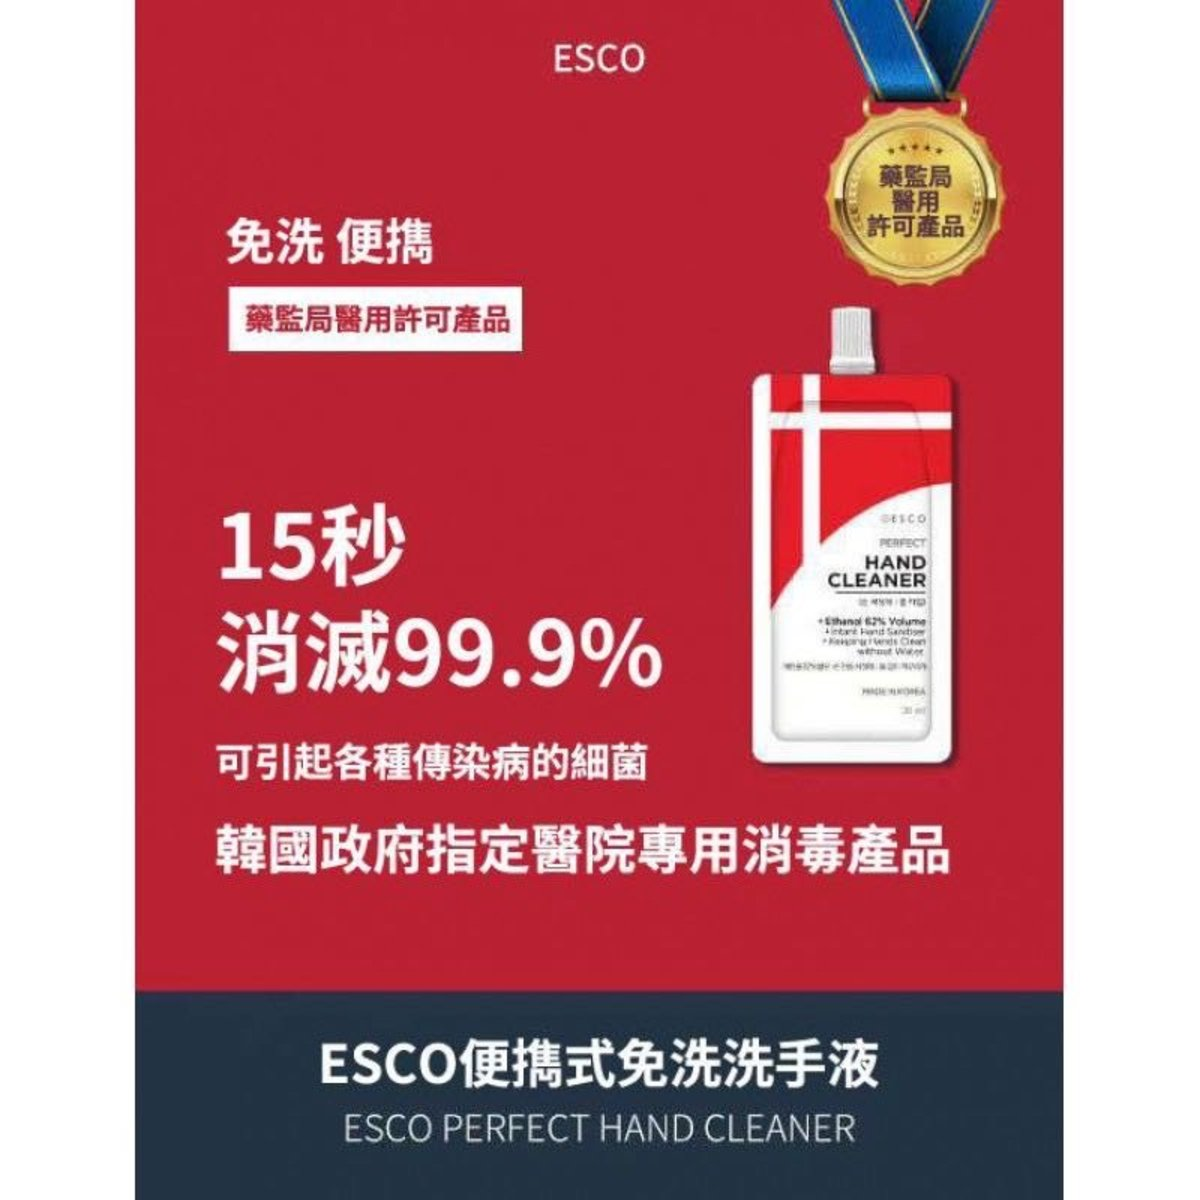 ESCO PERFECT HAND SANITIZER 30ML